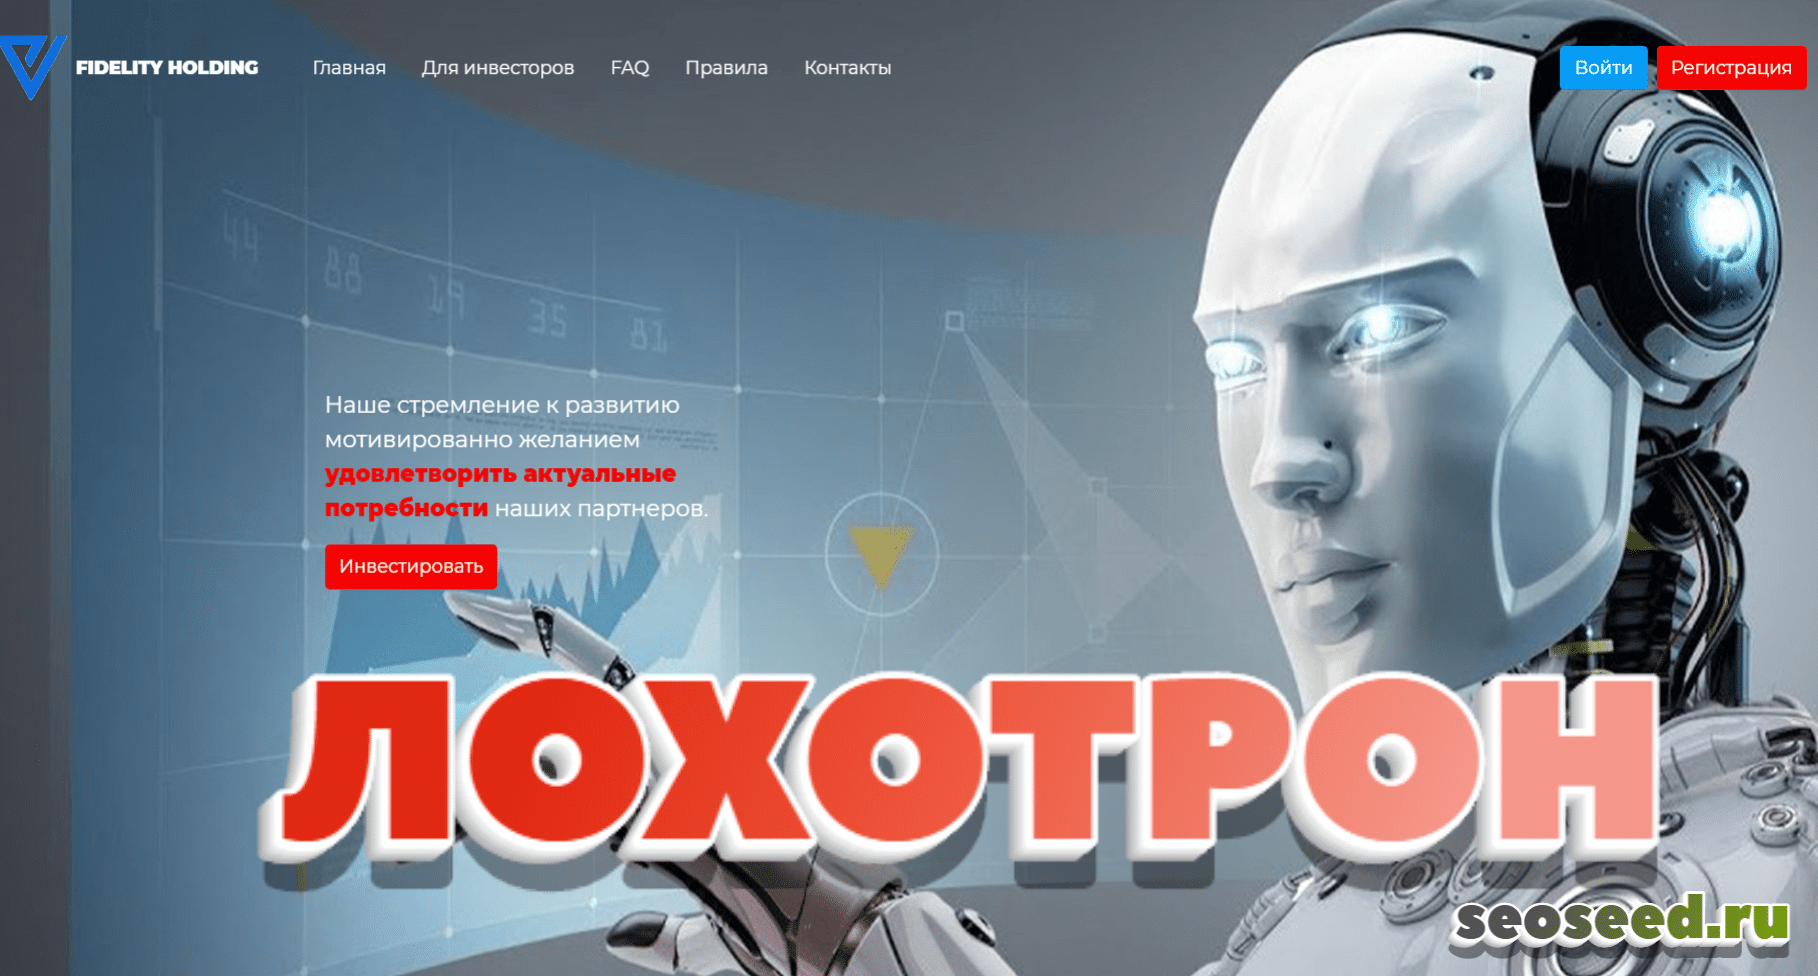 Fidelity Holding - трейдинговой холдинг. Отзывы о fidelity-holding.ru